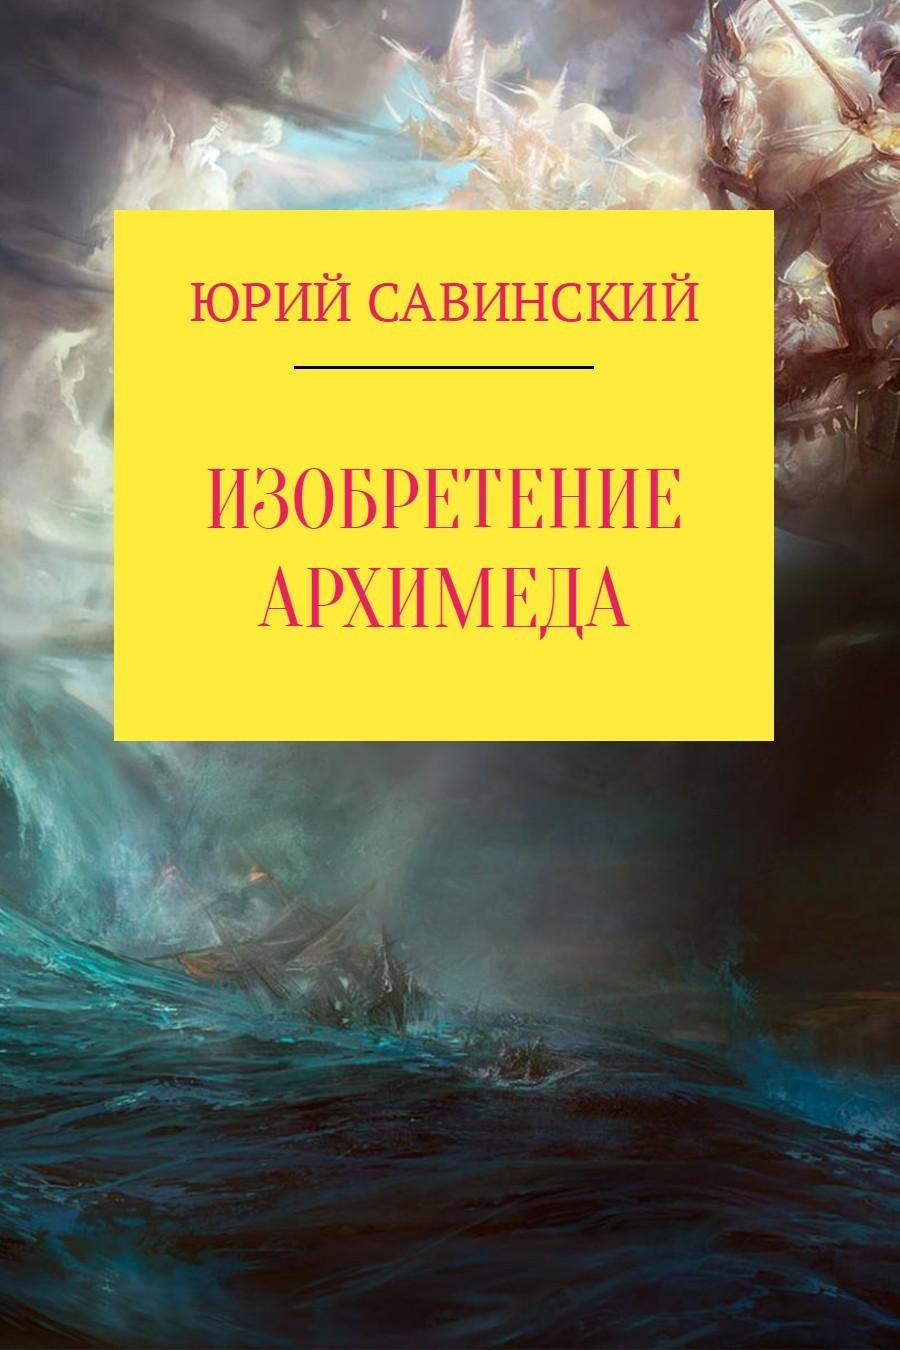 Юрий Эзекейлевич Савинский Изобретение Архимеда сергей коровин изобретение оружия